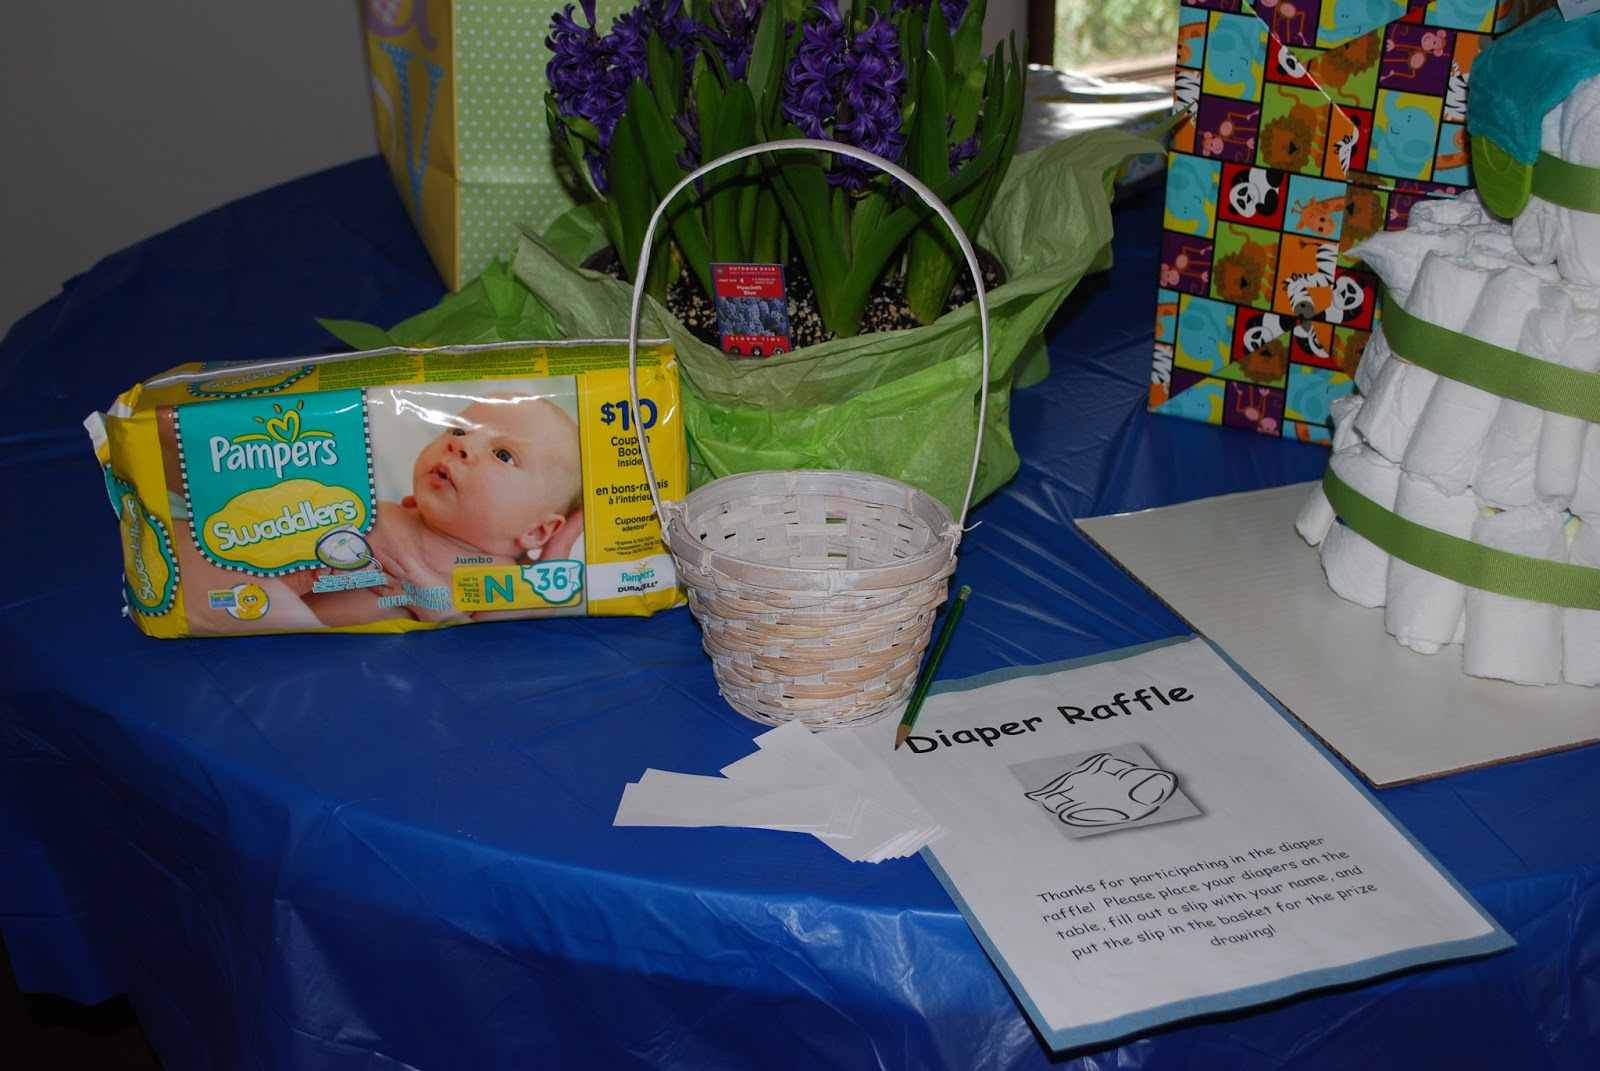 Diaper Raffle Gift Ideas - Gift Ftempo